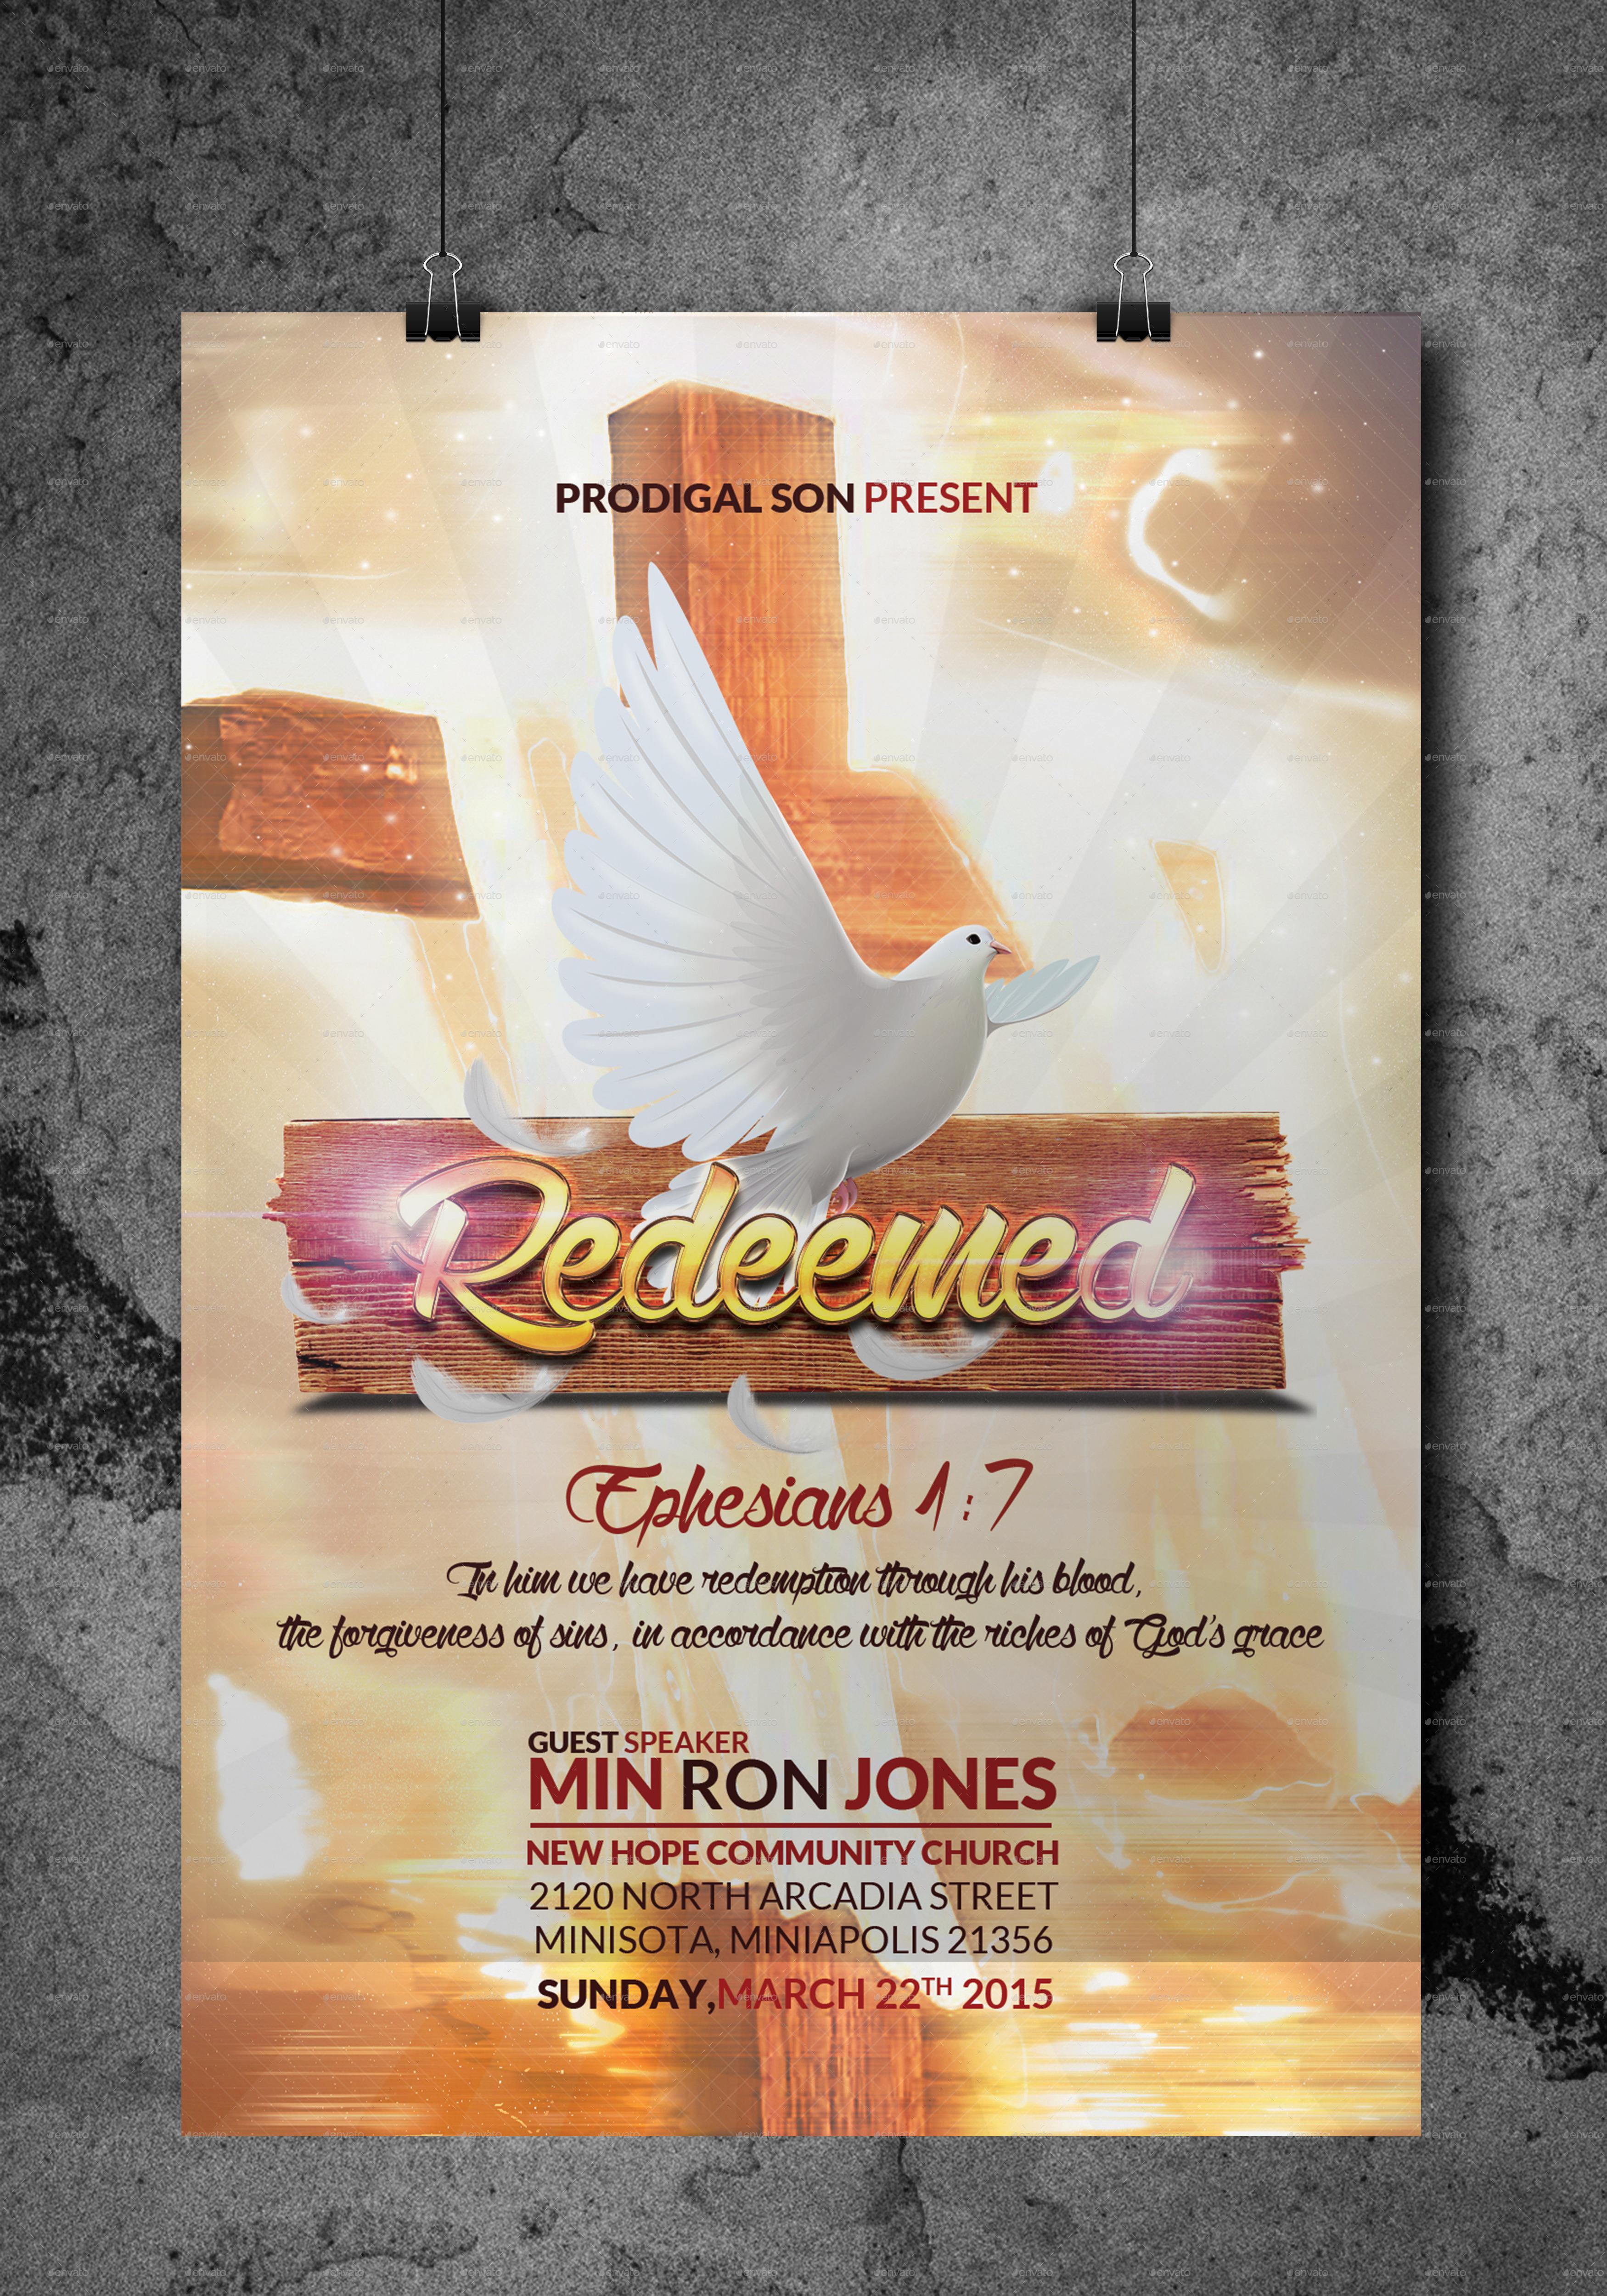 redeemed church flyer by kill bill graphicriver redeemed church flyer jpg preview 1 jpg preview 2 jpg